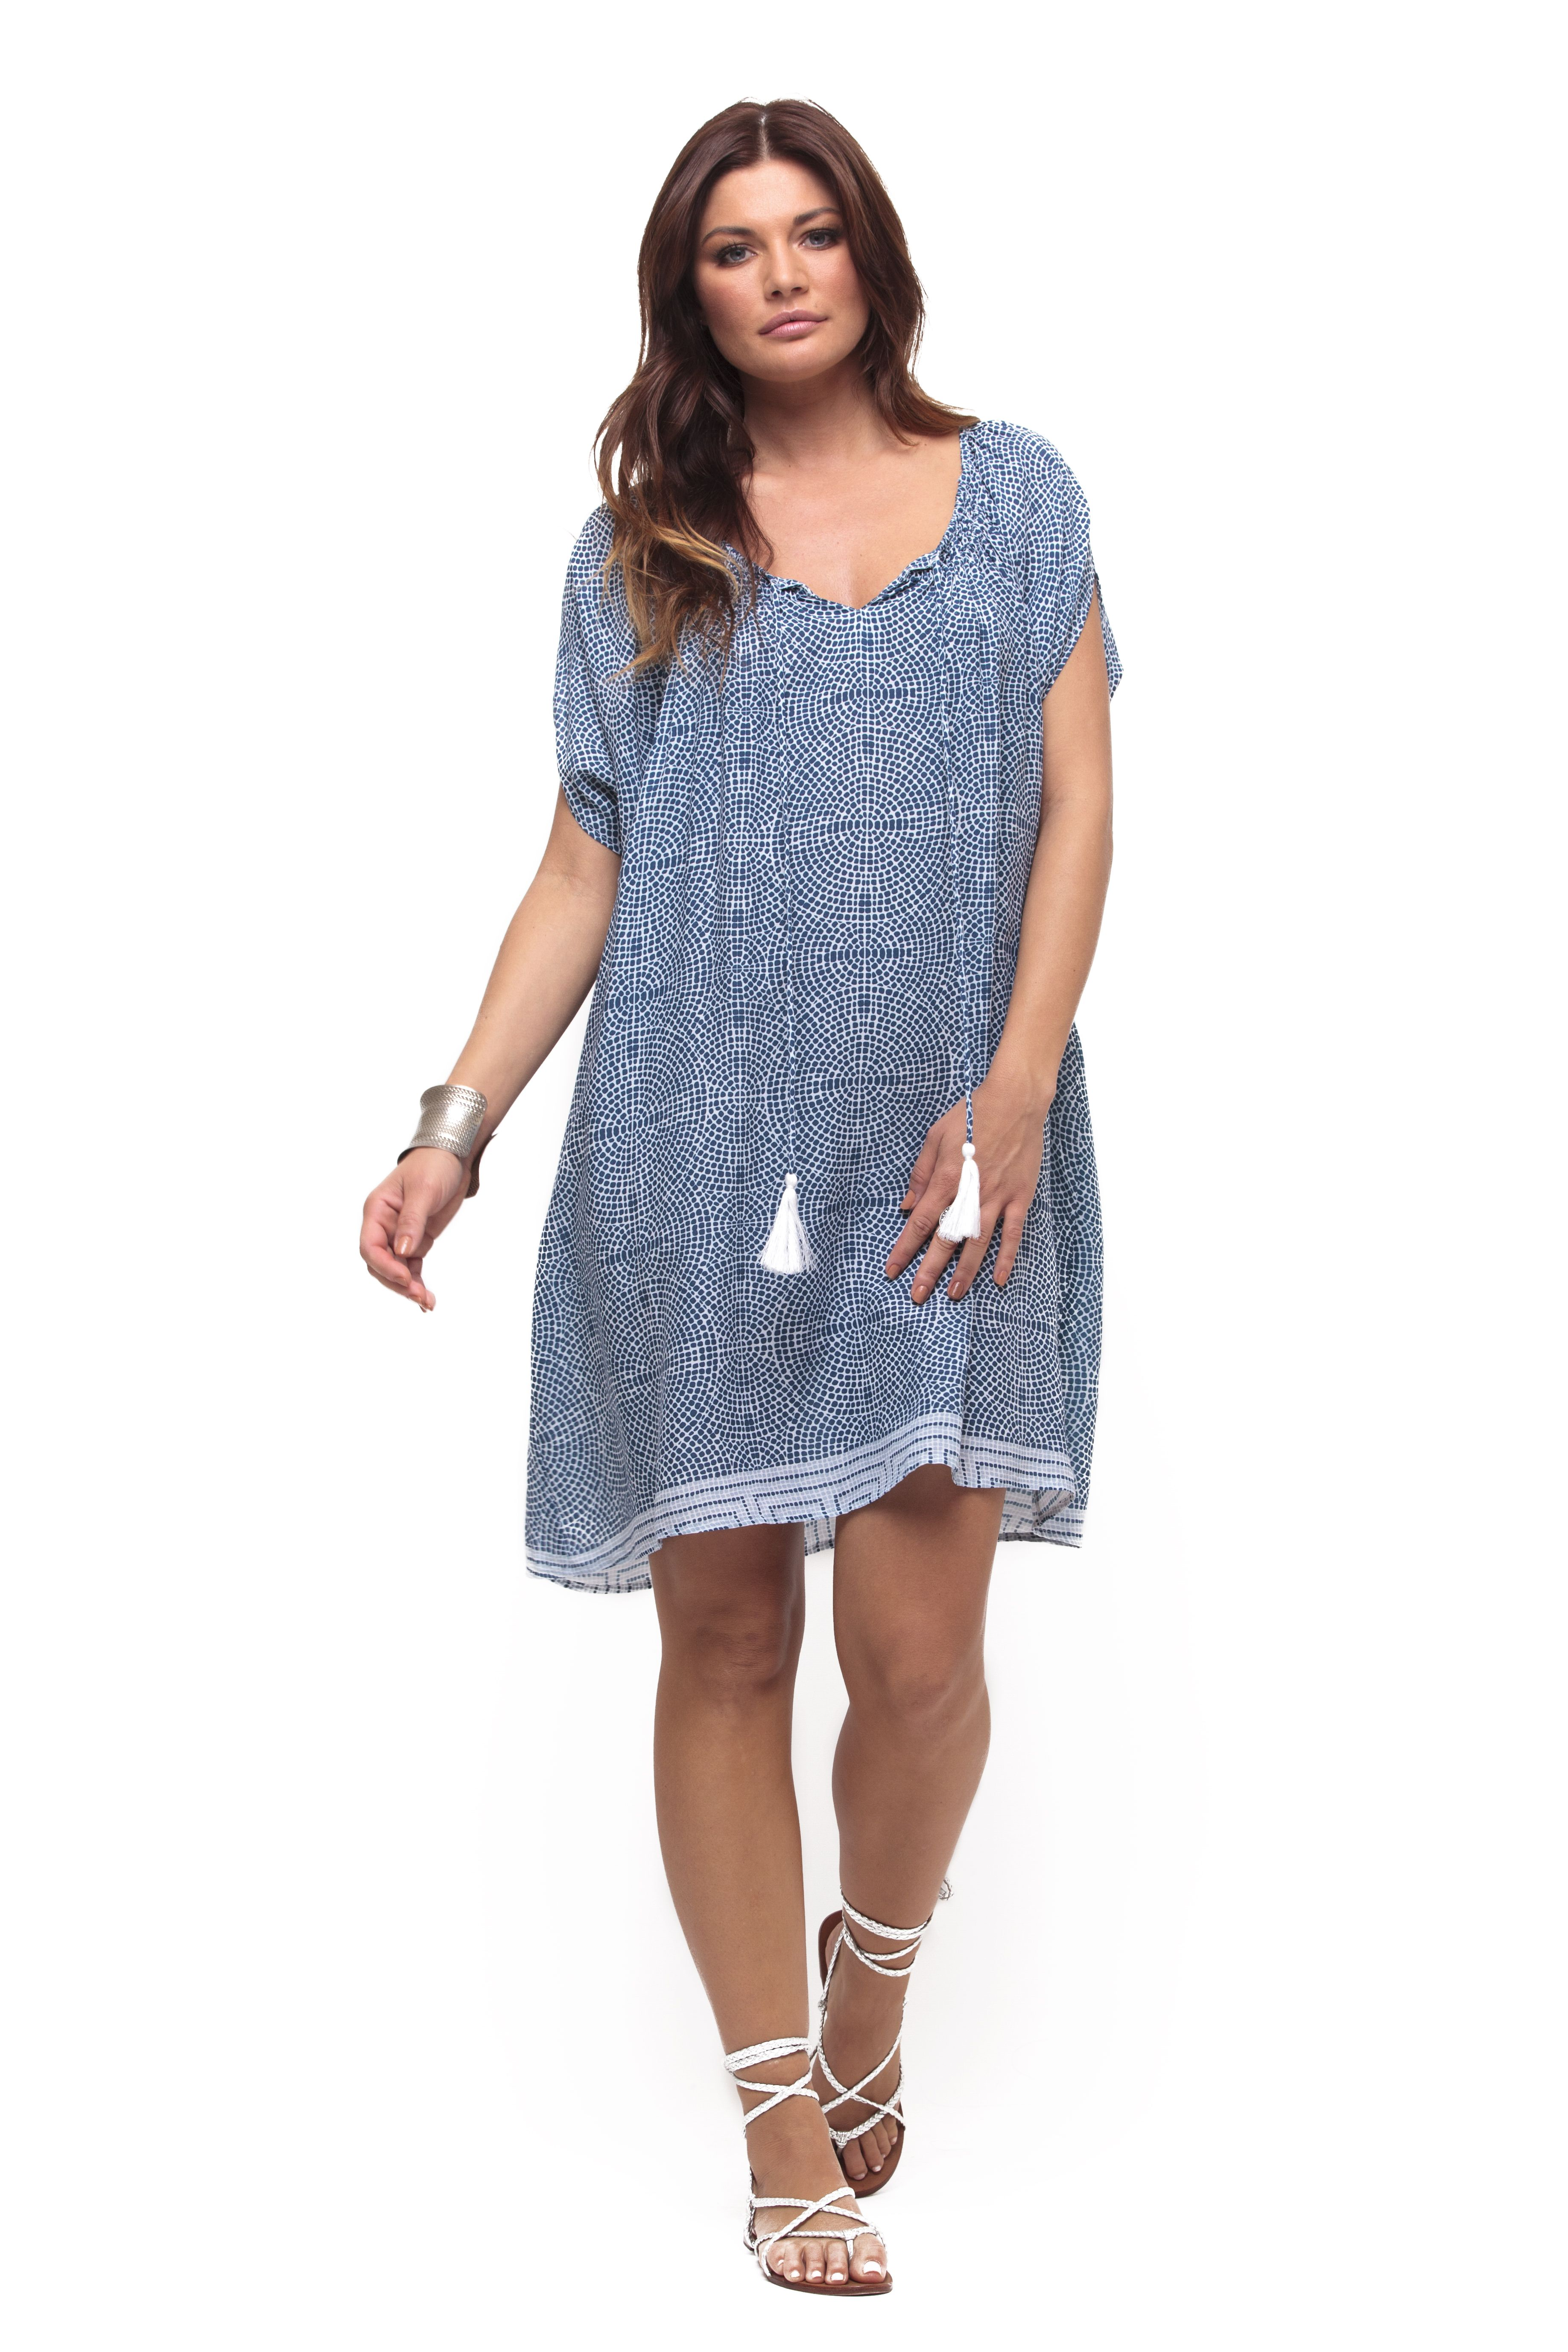 75049545b8d6c Kalokeri | Resort wear, Beachwear, Kaftans, Summer Dresses, Coverups,  Jumpsuits and Pants. Standard sizes and Plus size. (sizes 10-24)  wwww.kalokeri.com.au